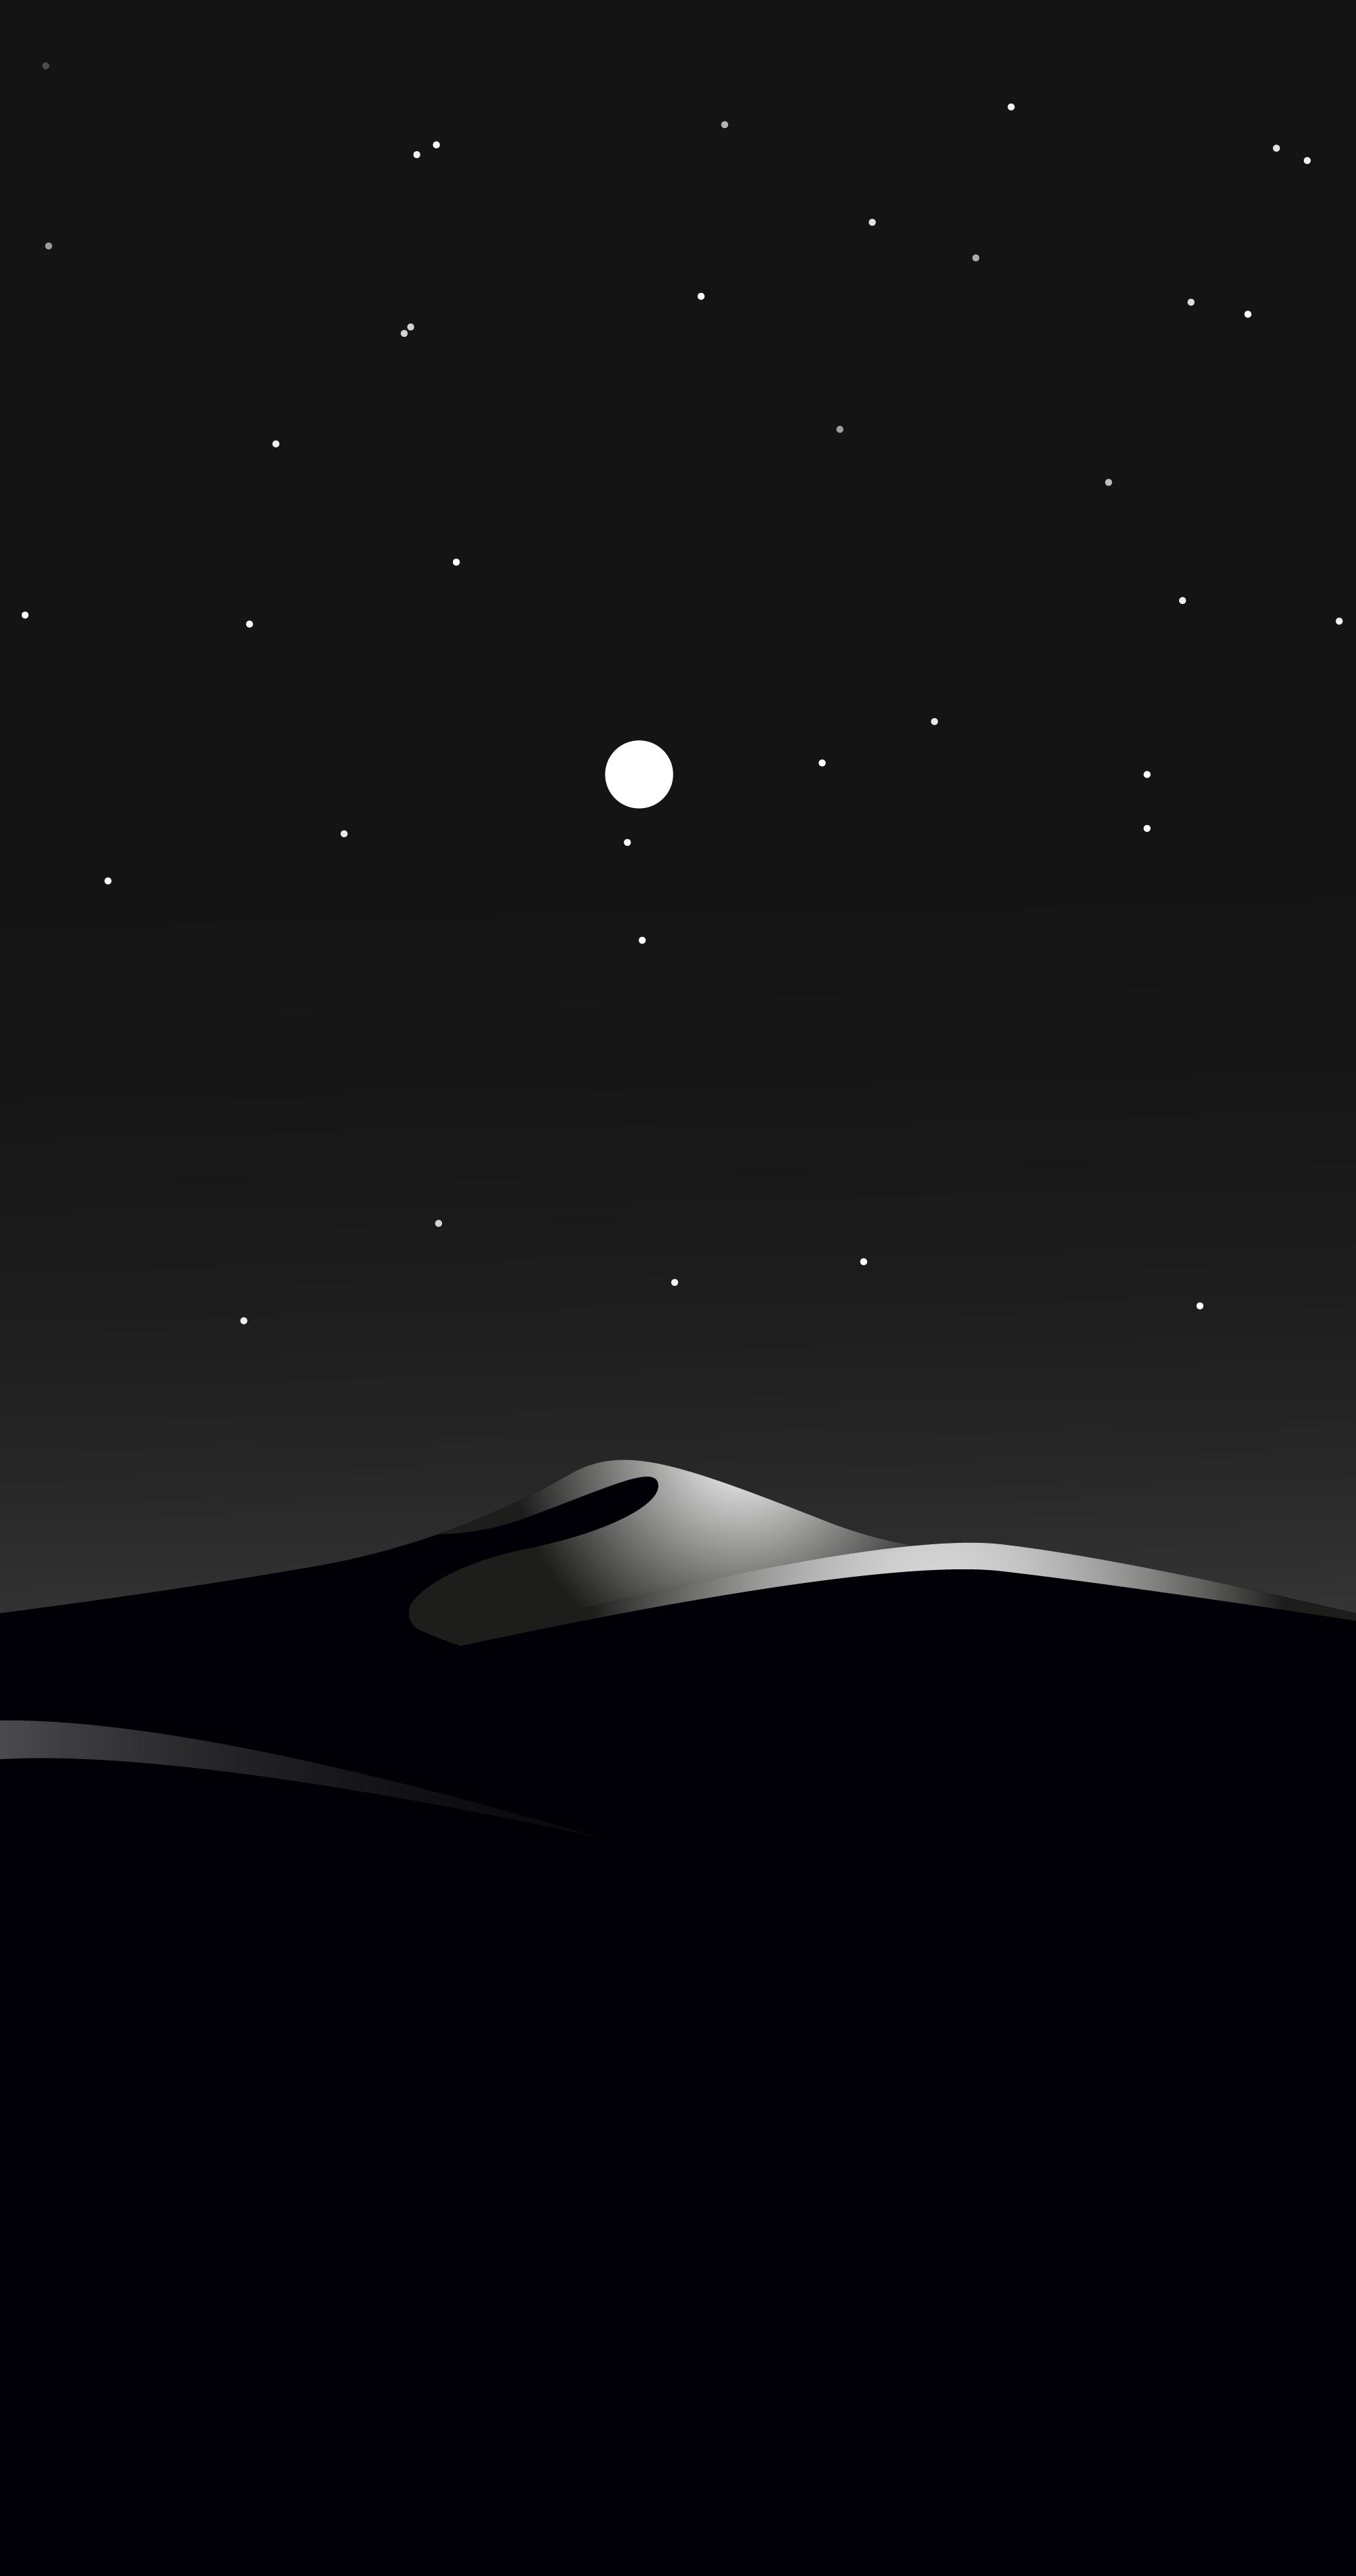 Dark Night Mobile Wallpaper